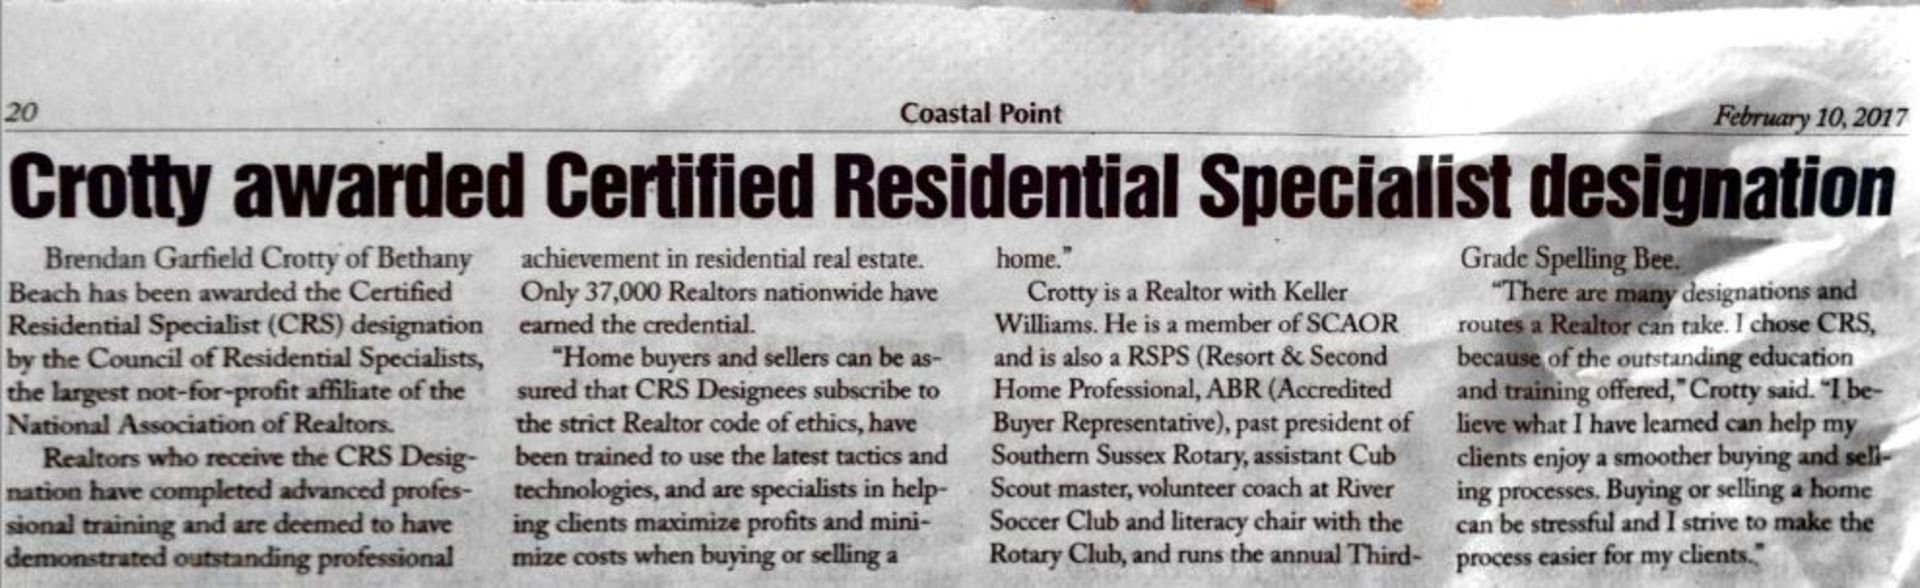 Crotty Awarded CRS Designation